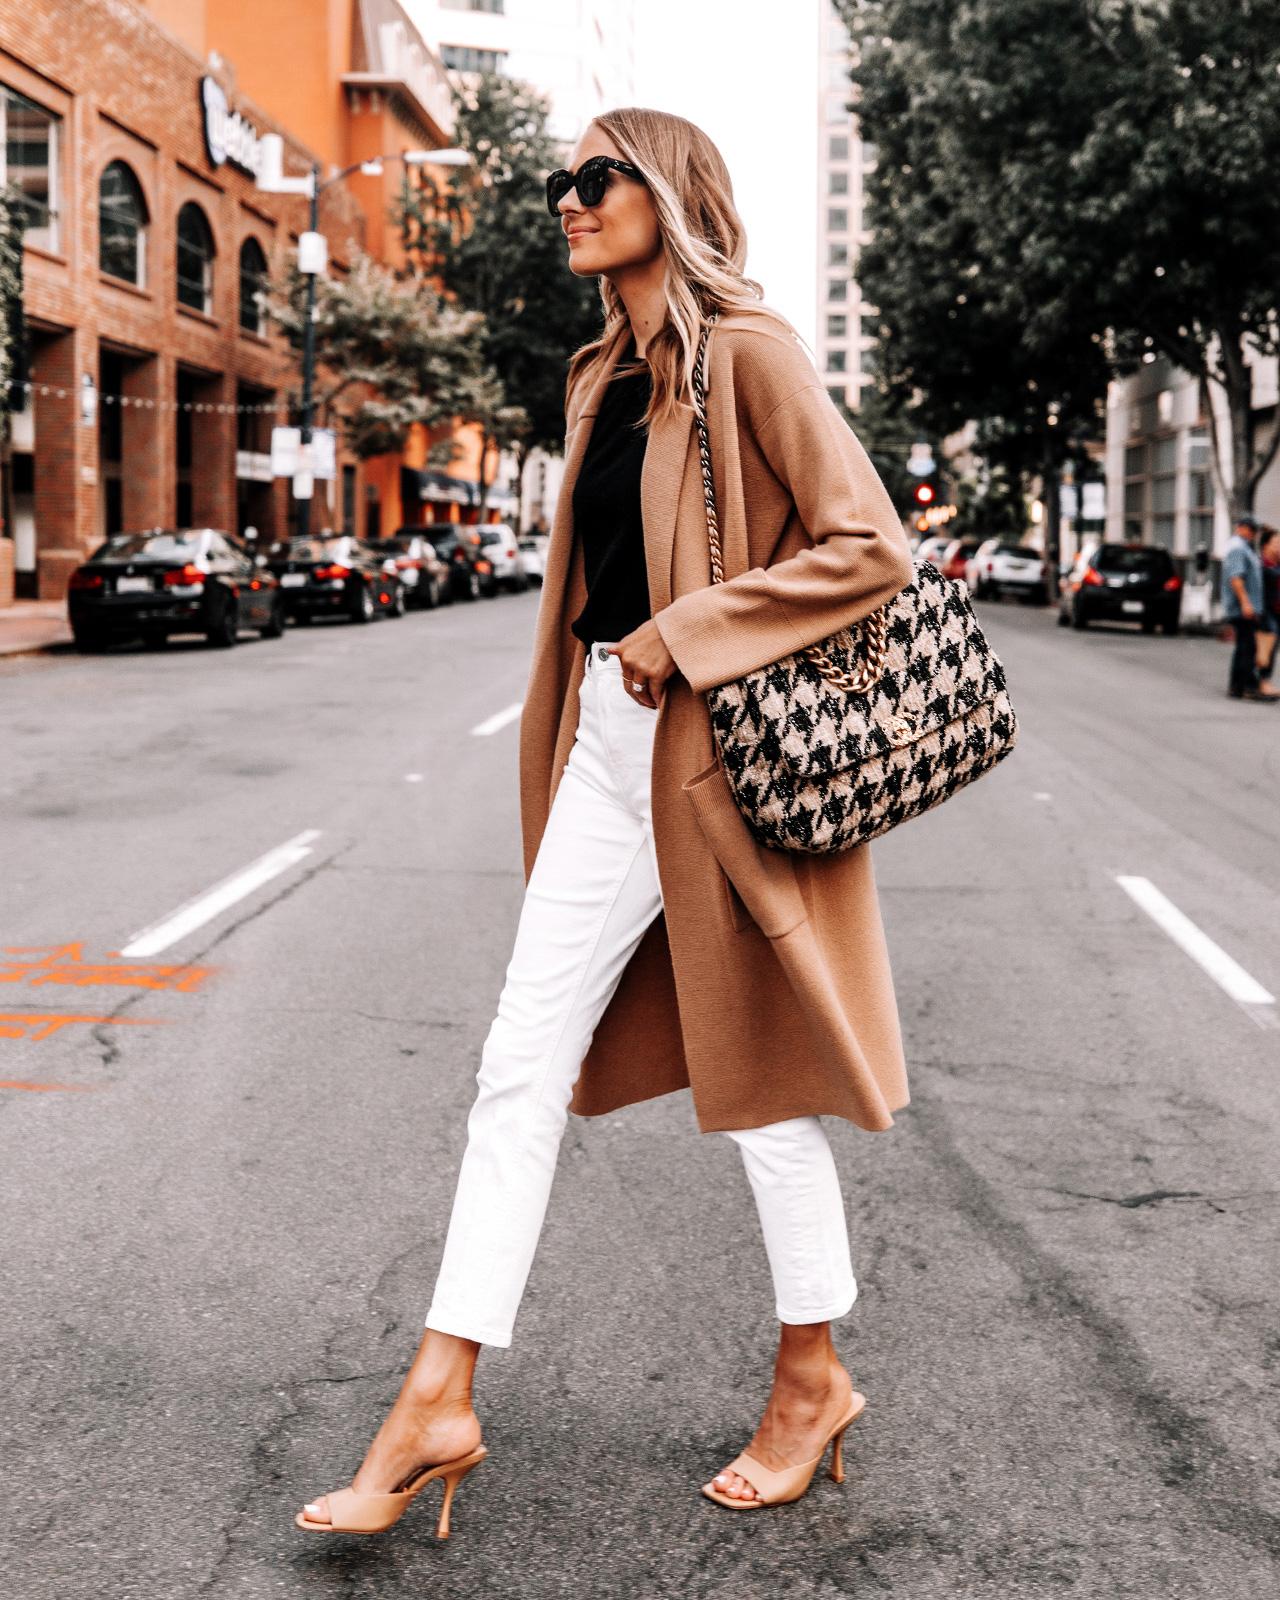 Fashion Jackson Wearing White Jeans with Camel Coatigan Black Sweater Tan Heeled Sandals Chanel 19 Houndstooth Maxi Handbag